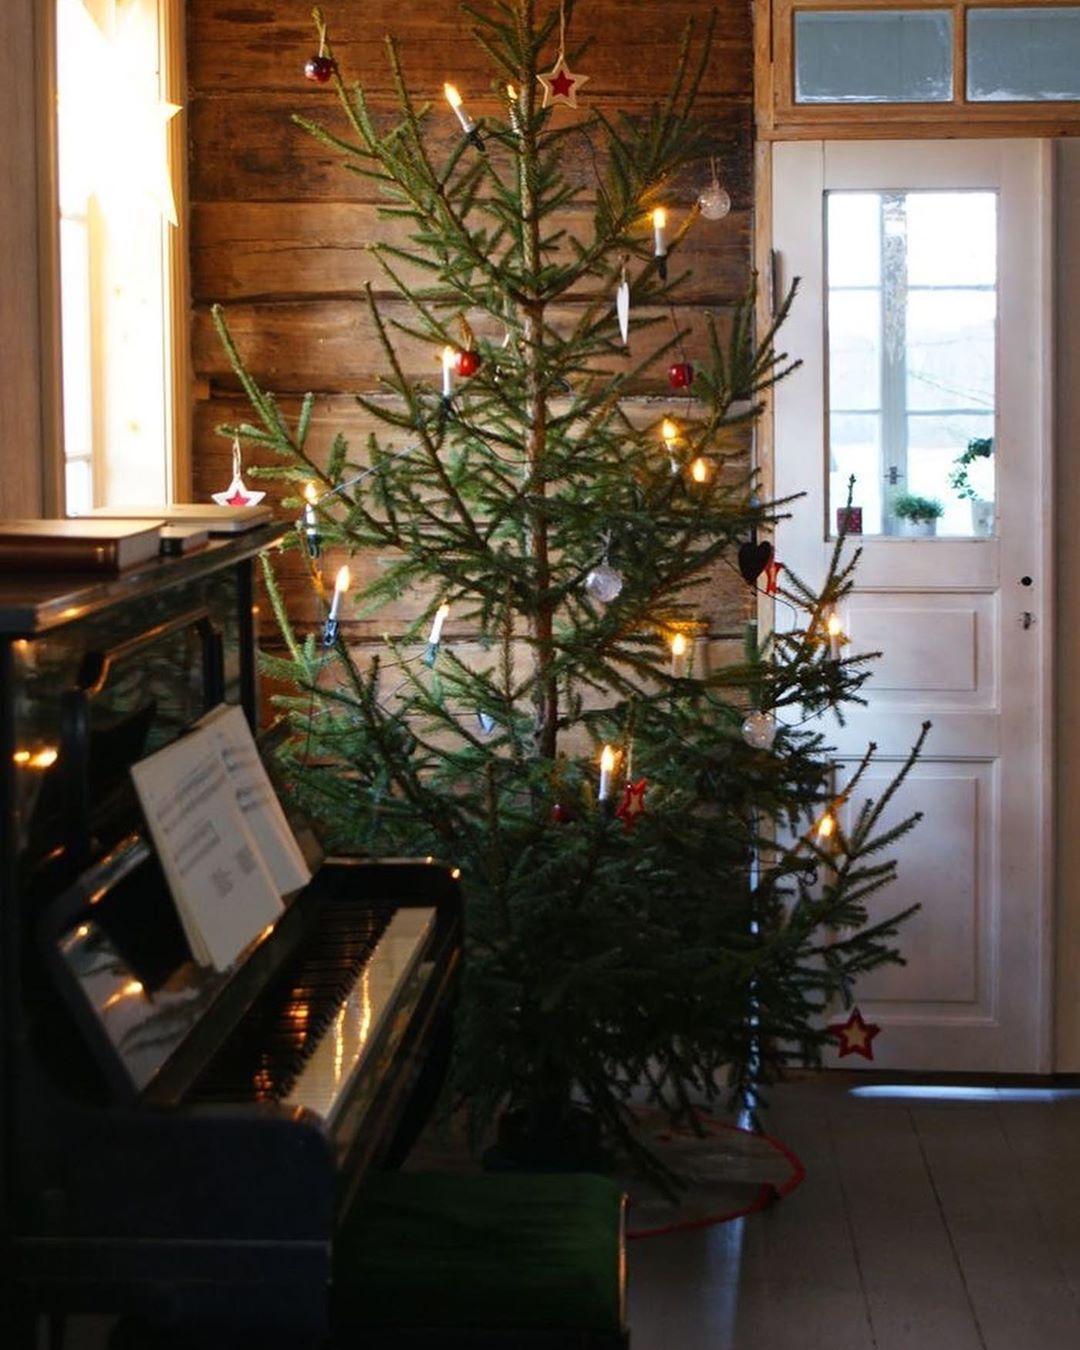 Xmas Jinglebell On Instagram 12 Days To Christmas Follow Xmas Jing Scandinavian Christmas Trees Christmas Decorations Christmas Tree Decorations